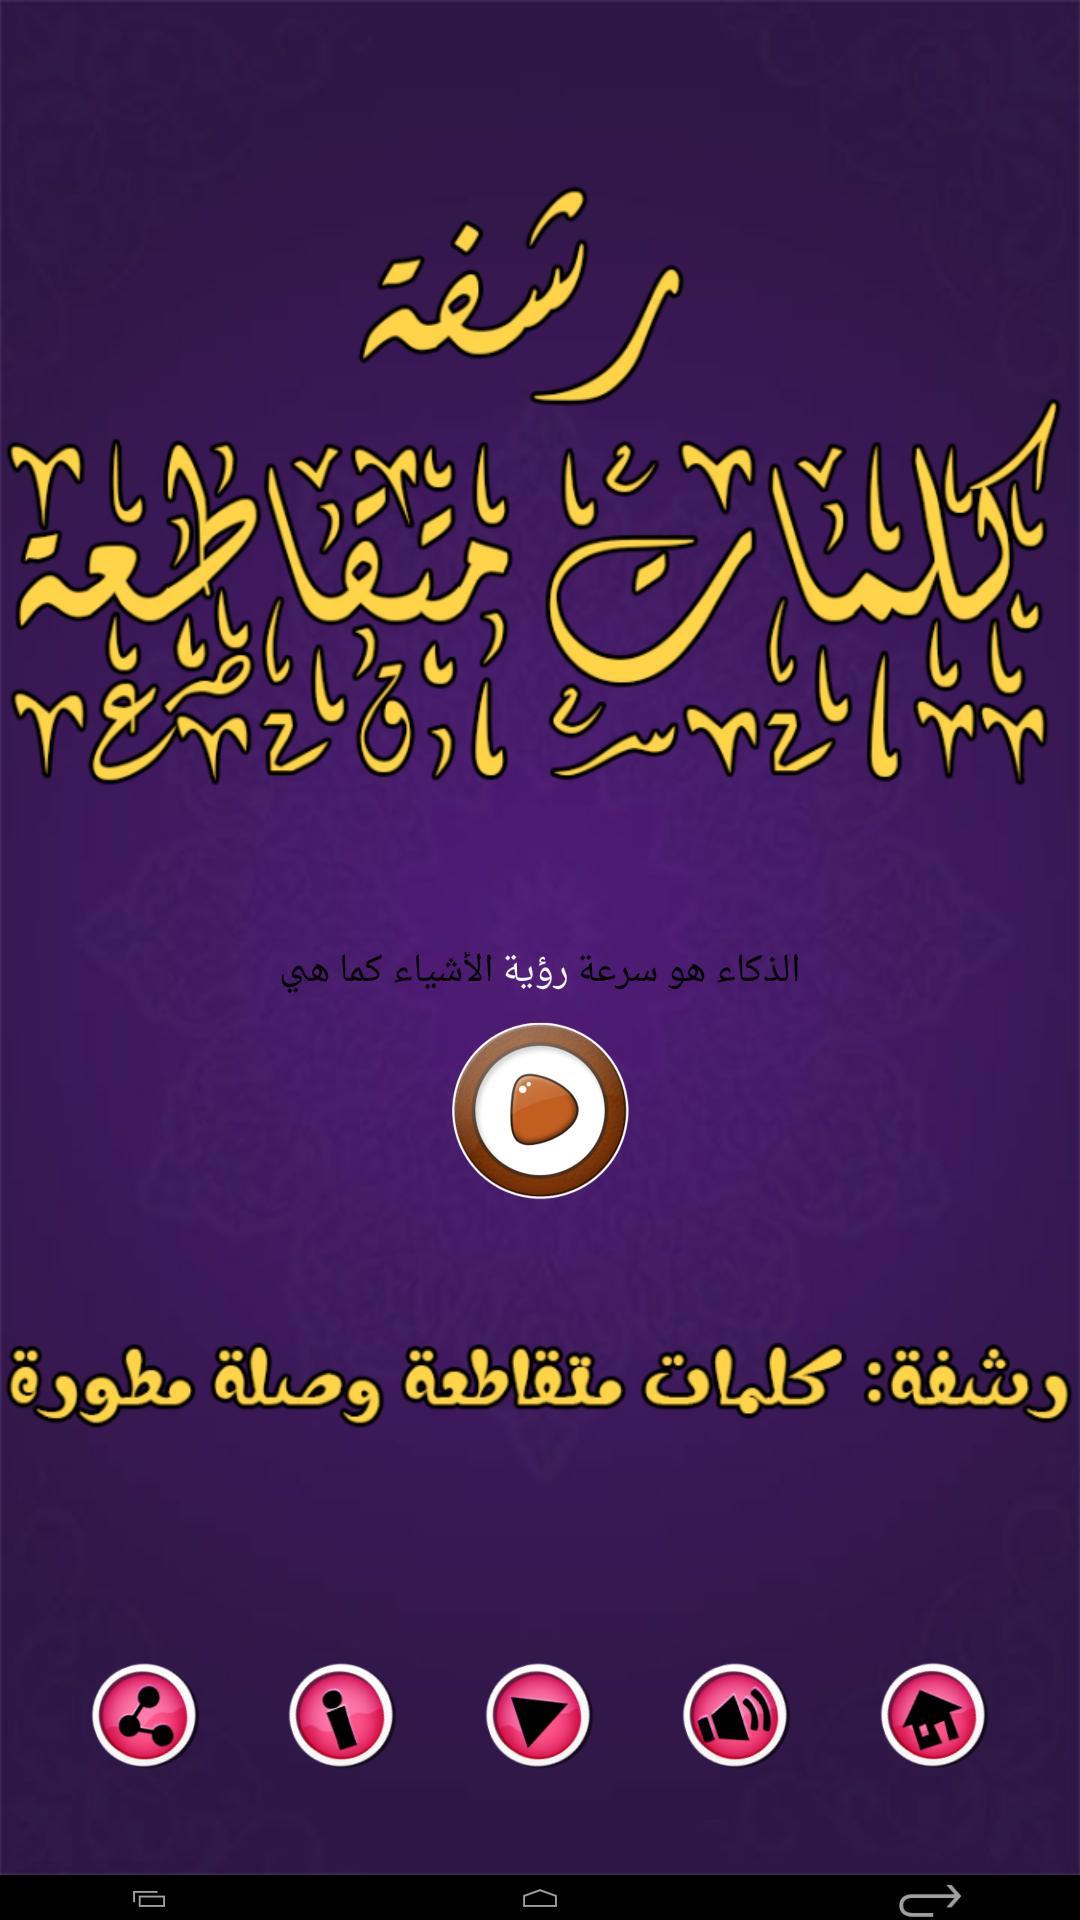 7773f6f690 كلما م قاطعة للاطفال Google Search Khoulakk Easy